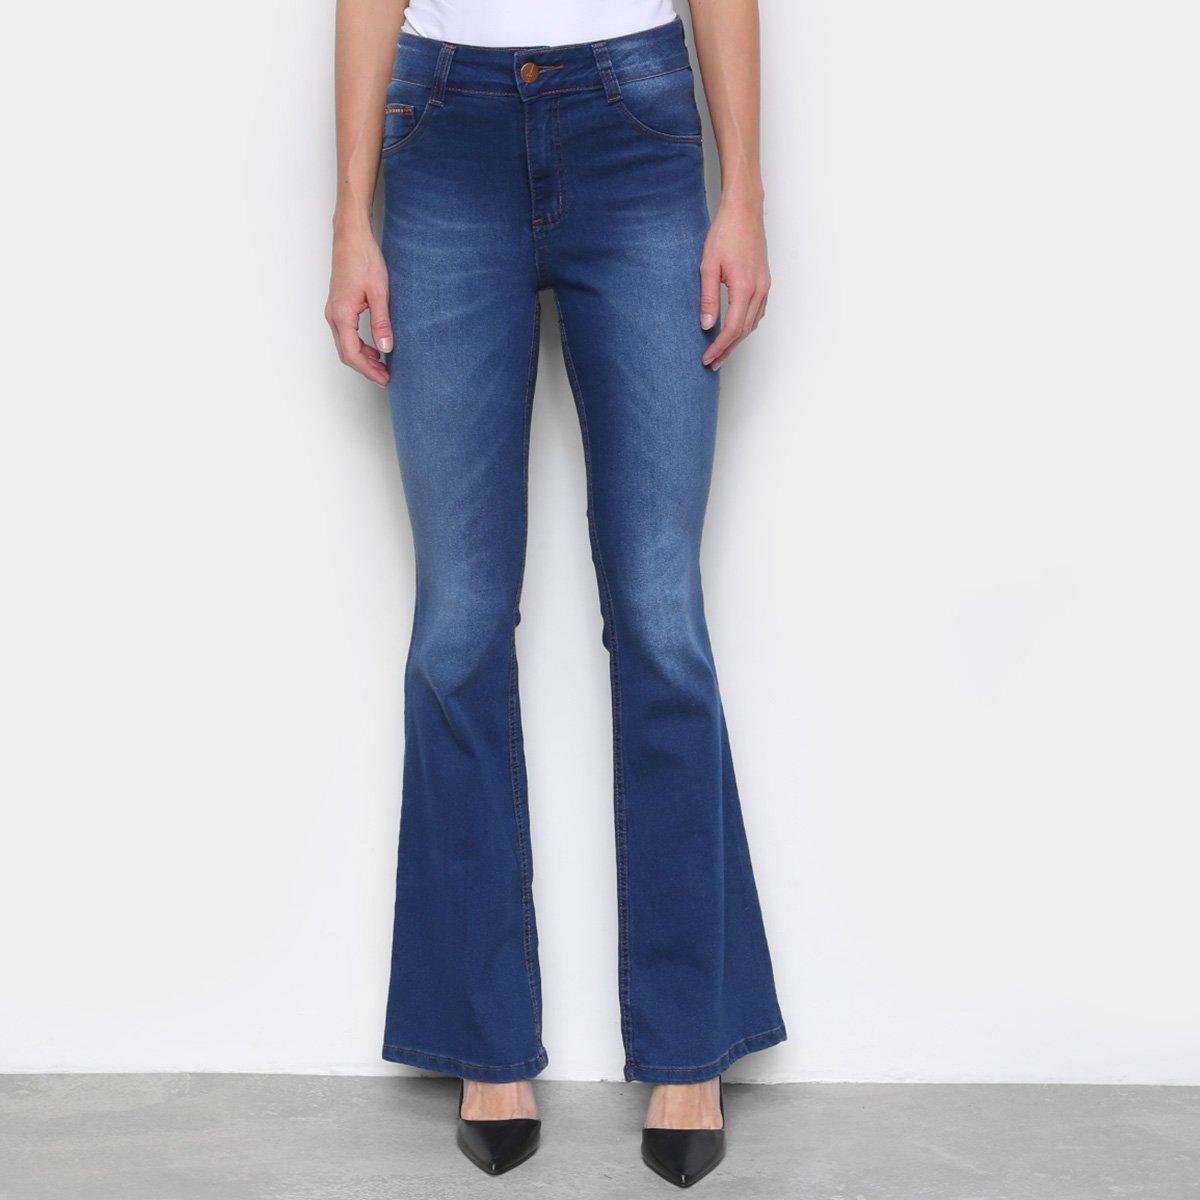 Calça Jeans Flare Biotipo Feminina